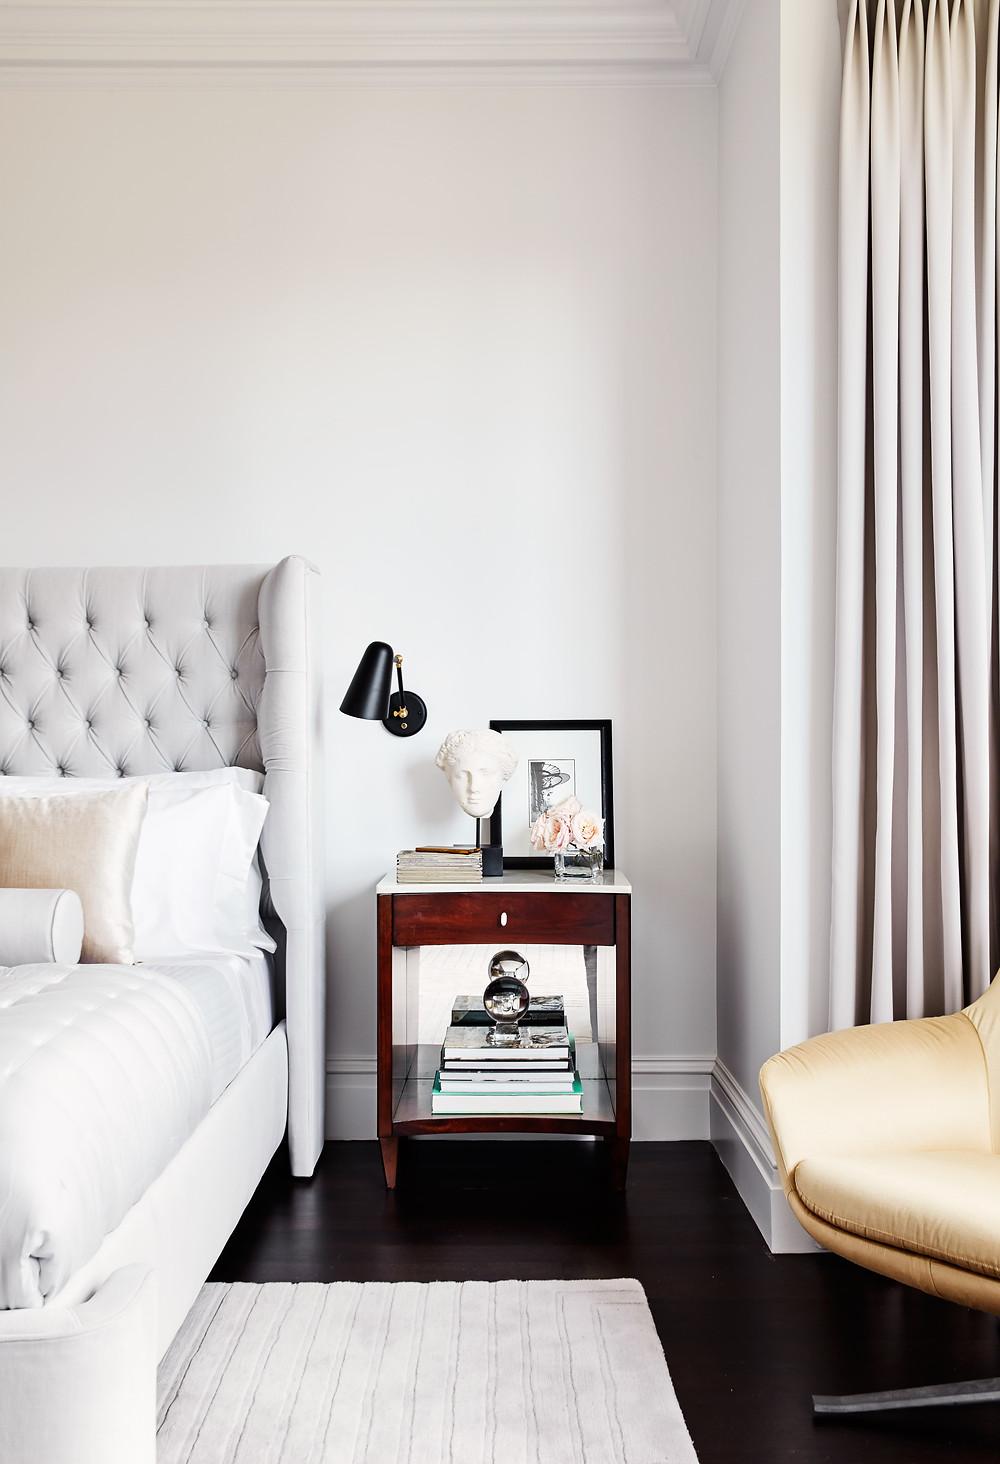 Master Bedroom, Lisa Tharp Design, Luxury, Bedroom, Upholstered bed, sconces, lounge, nightstand